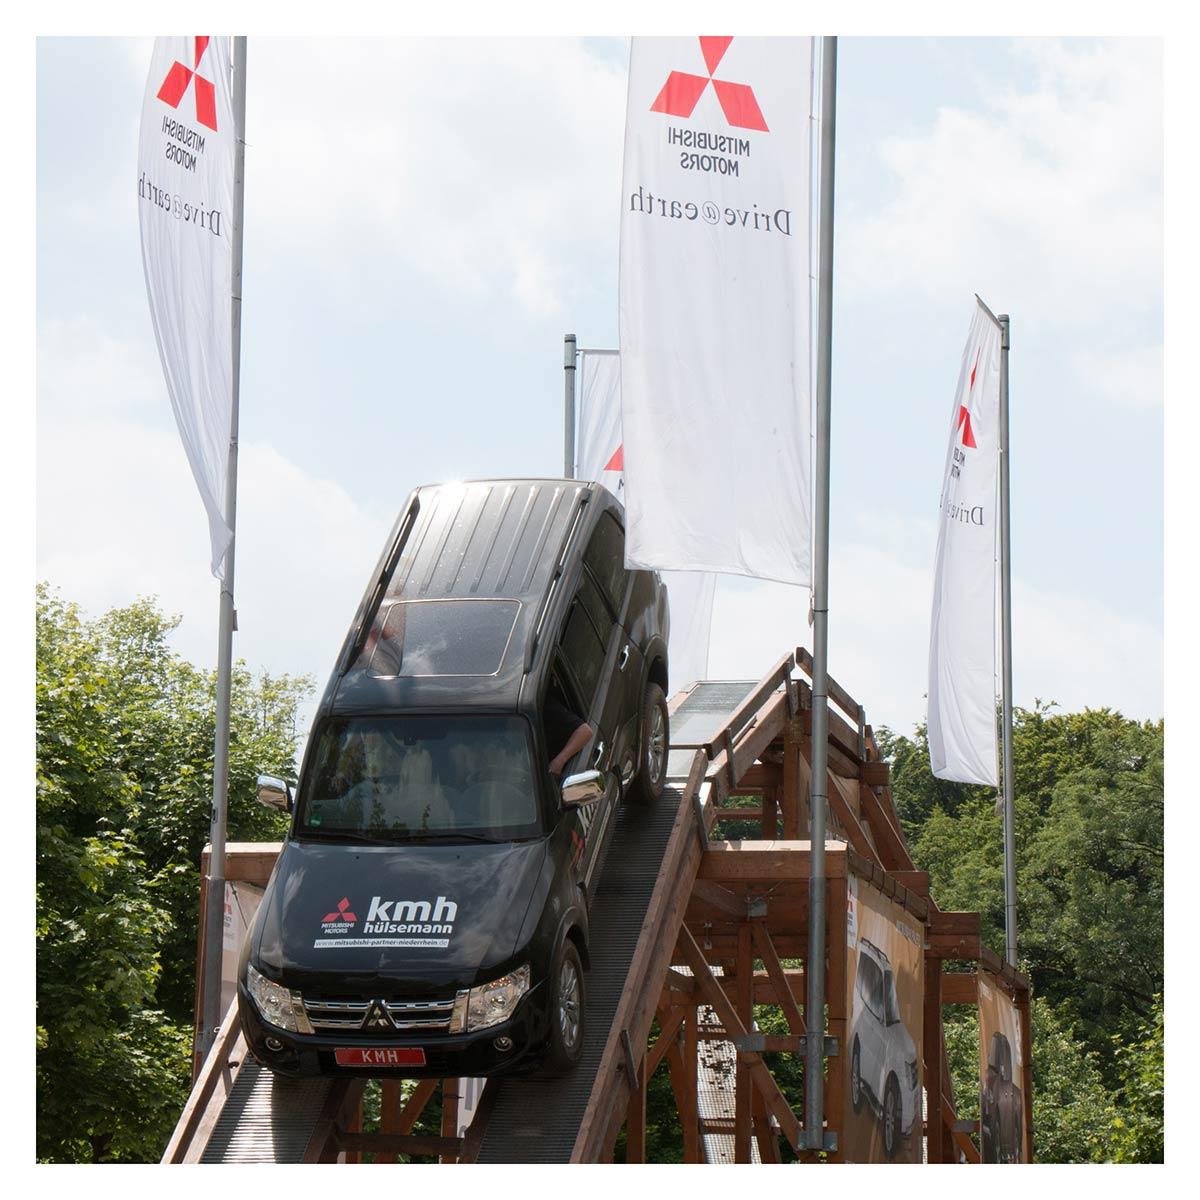 Event by Mitsubishi, Reiber Marketing Krefeld